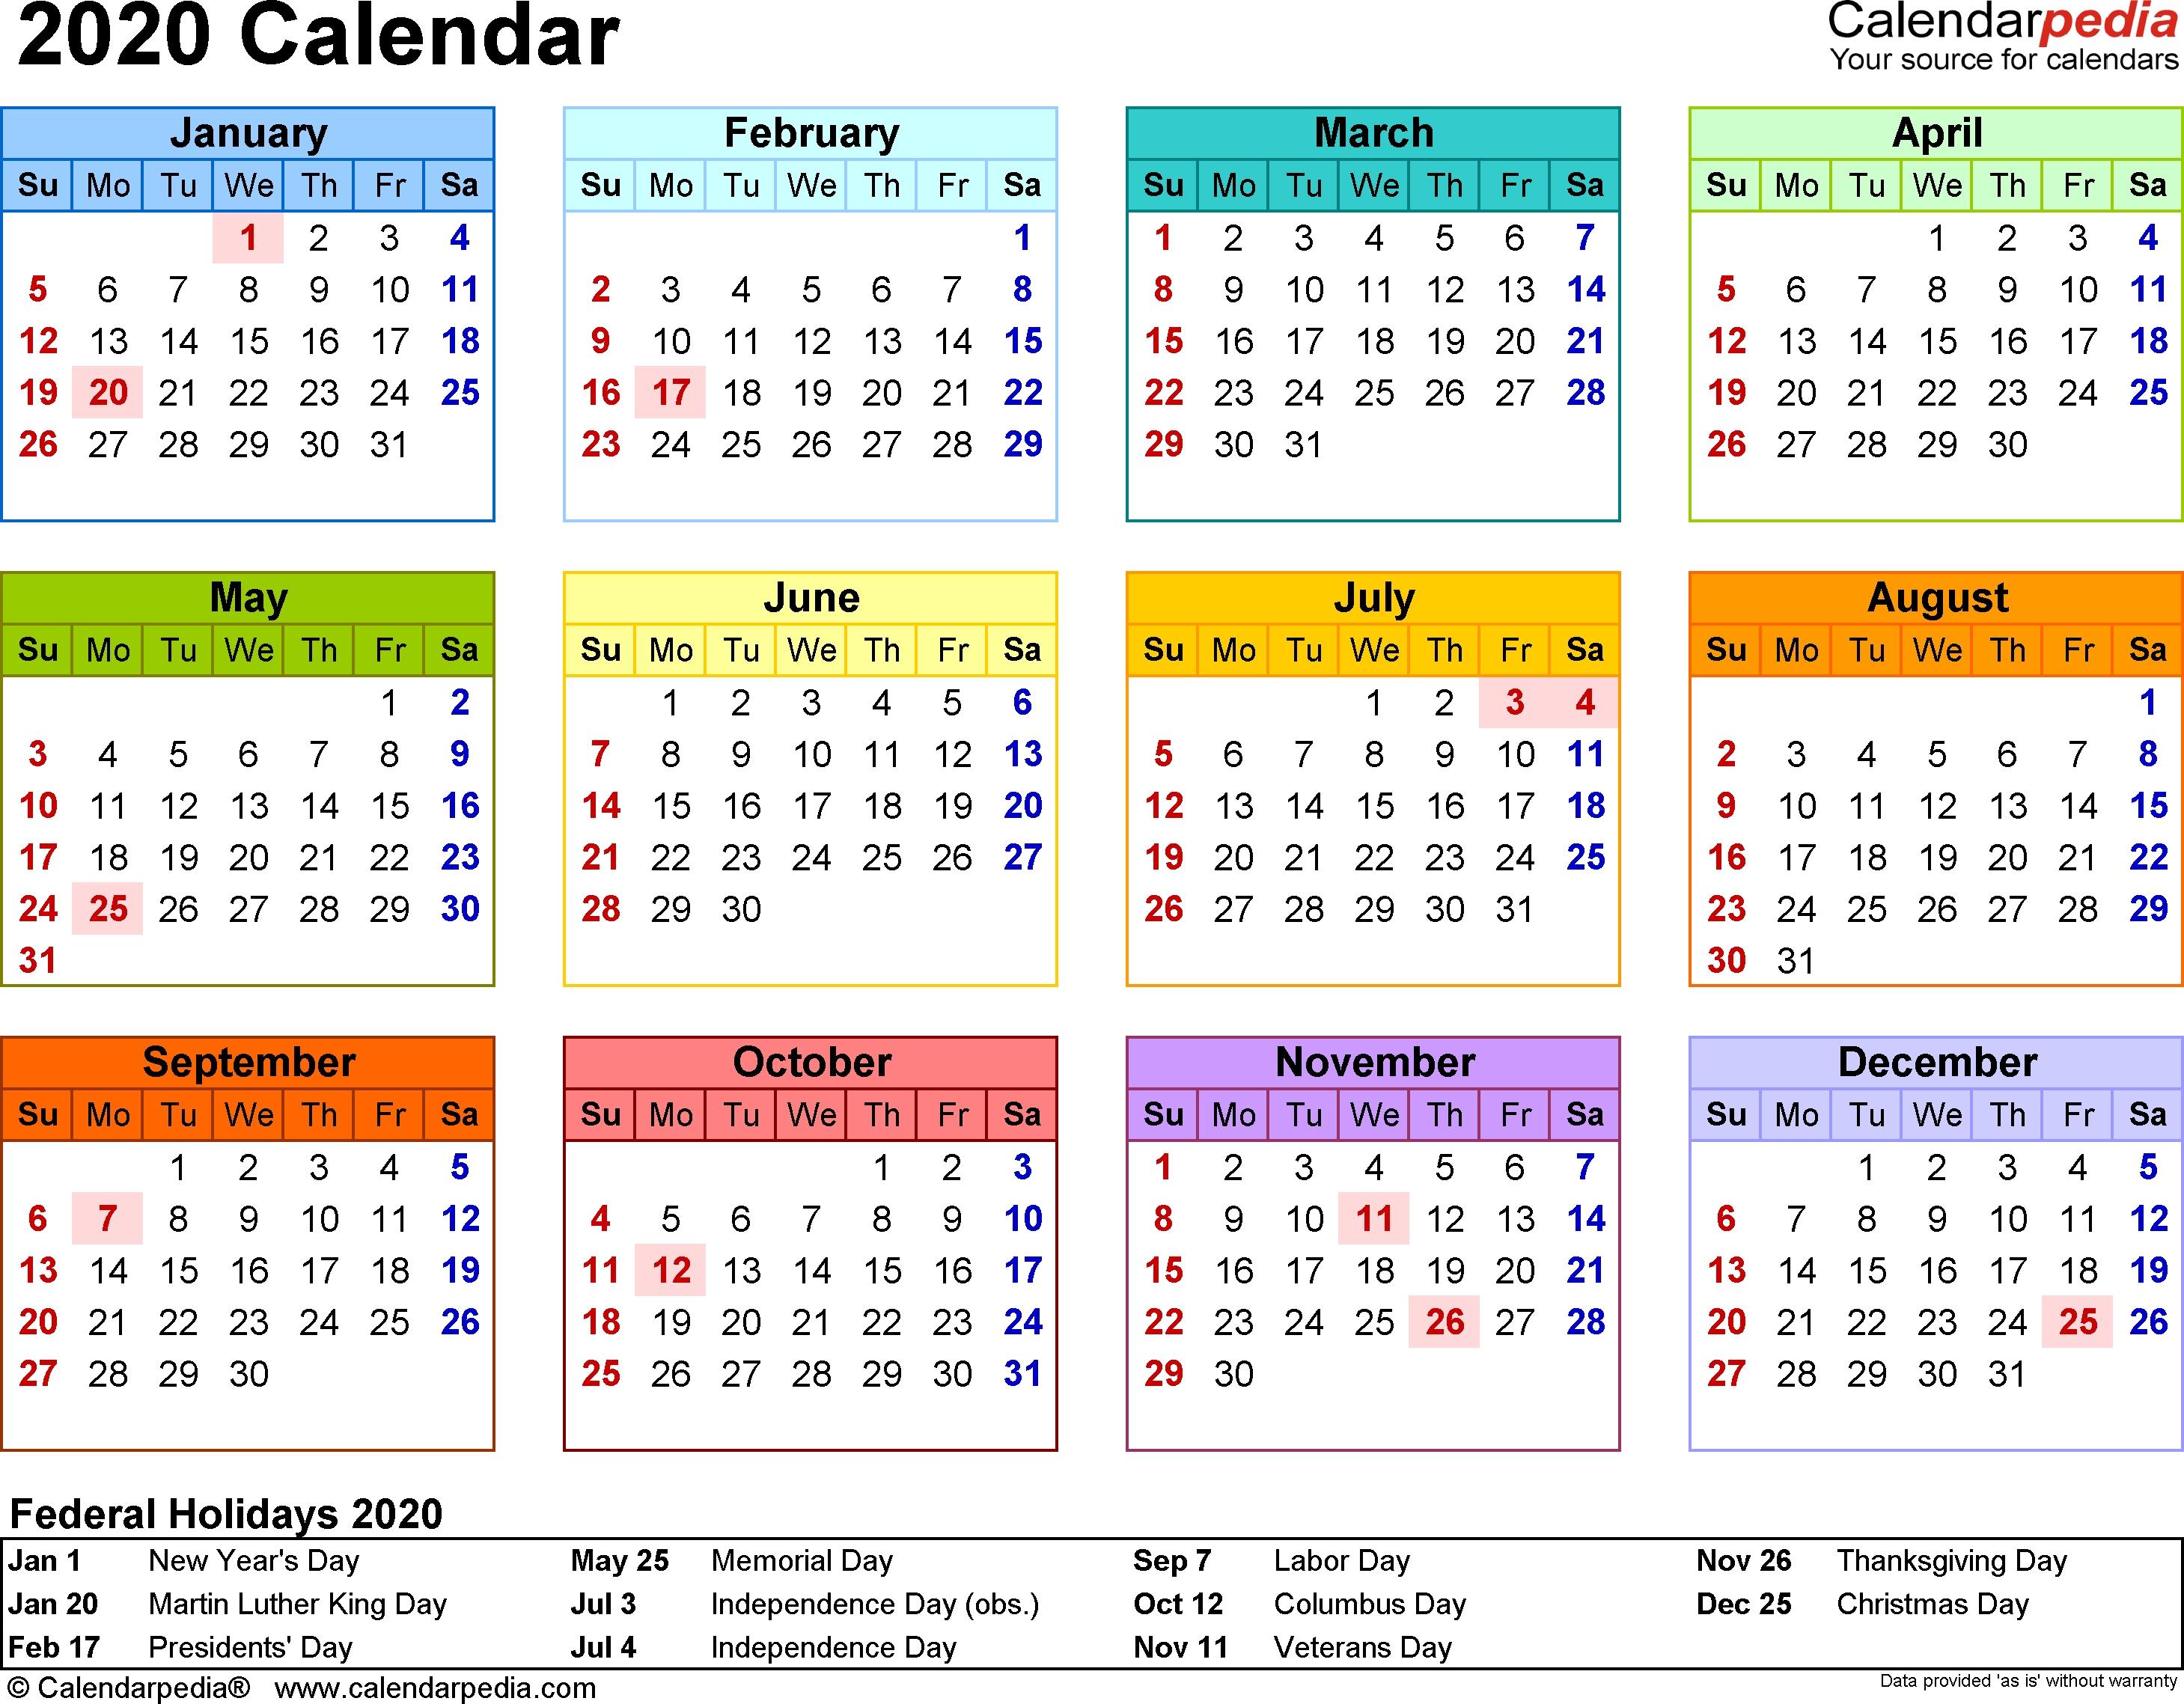 2020 Calendar Pdf - 18 Free Printable Calendar Templates-Indesign 2020 Calendar Template